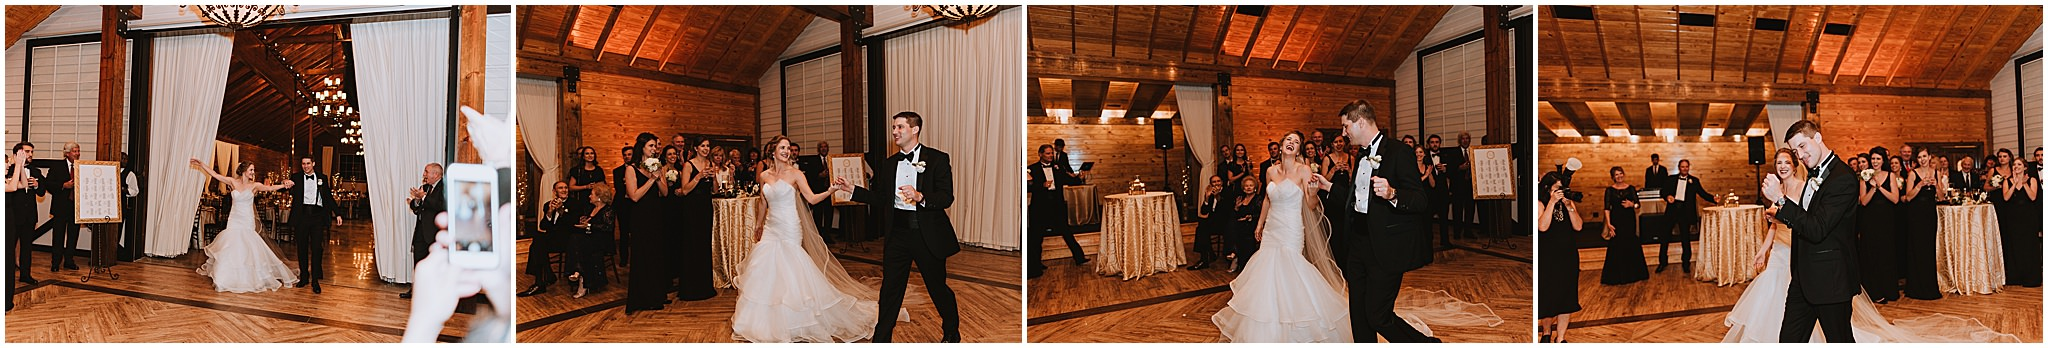 A Keswick Hall Golf Club Wedding in Charlottesville Virginia 272